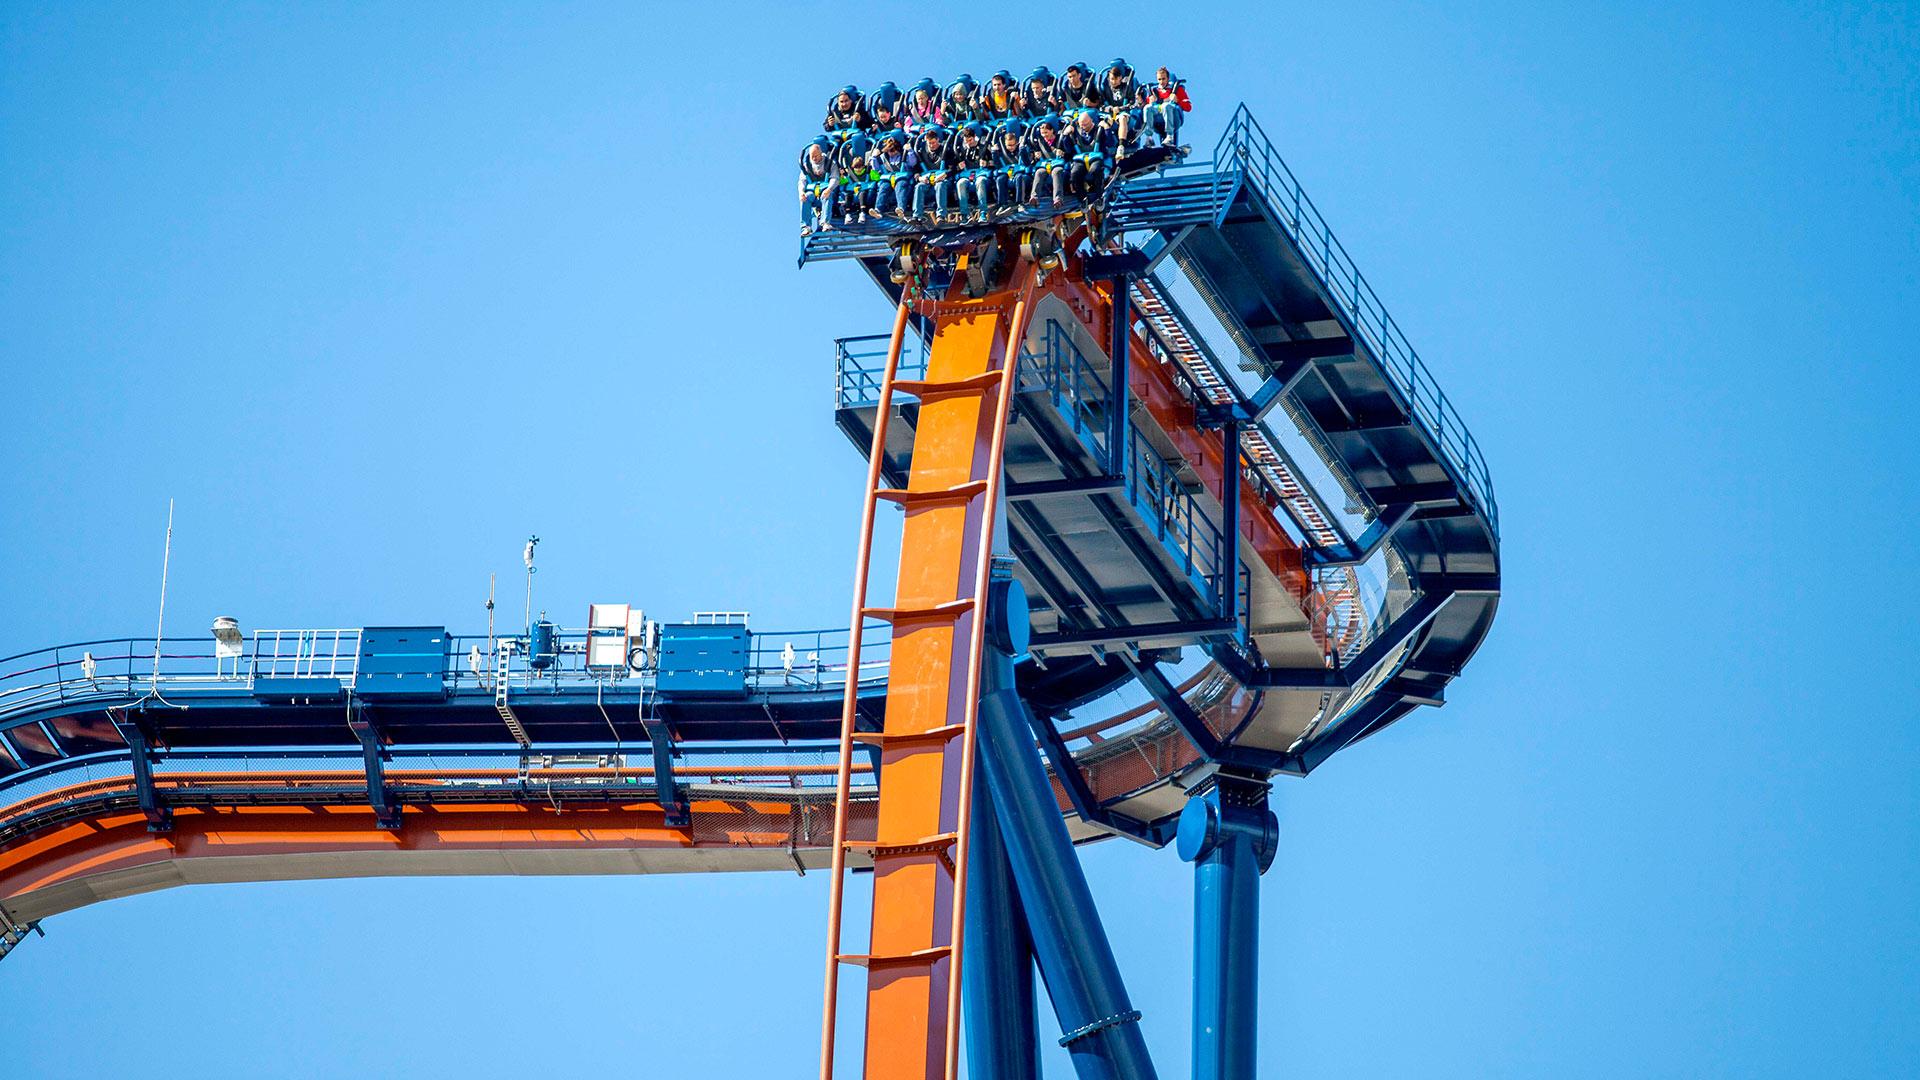 Dive coaster at Cedar Point in Ohio.